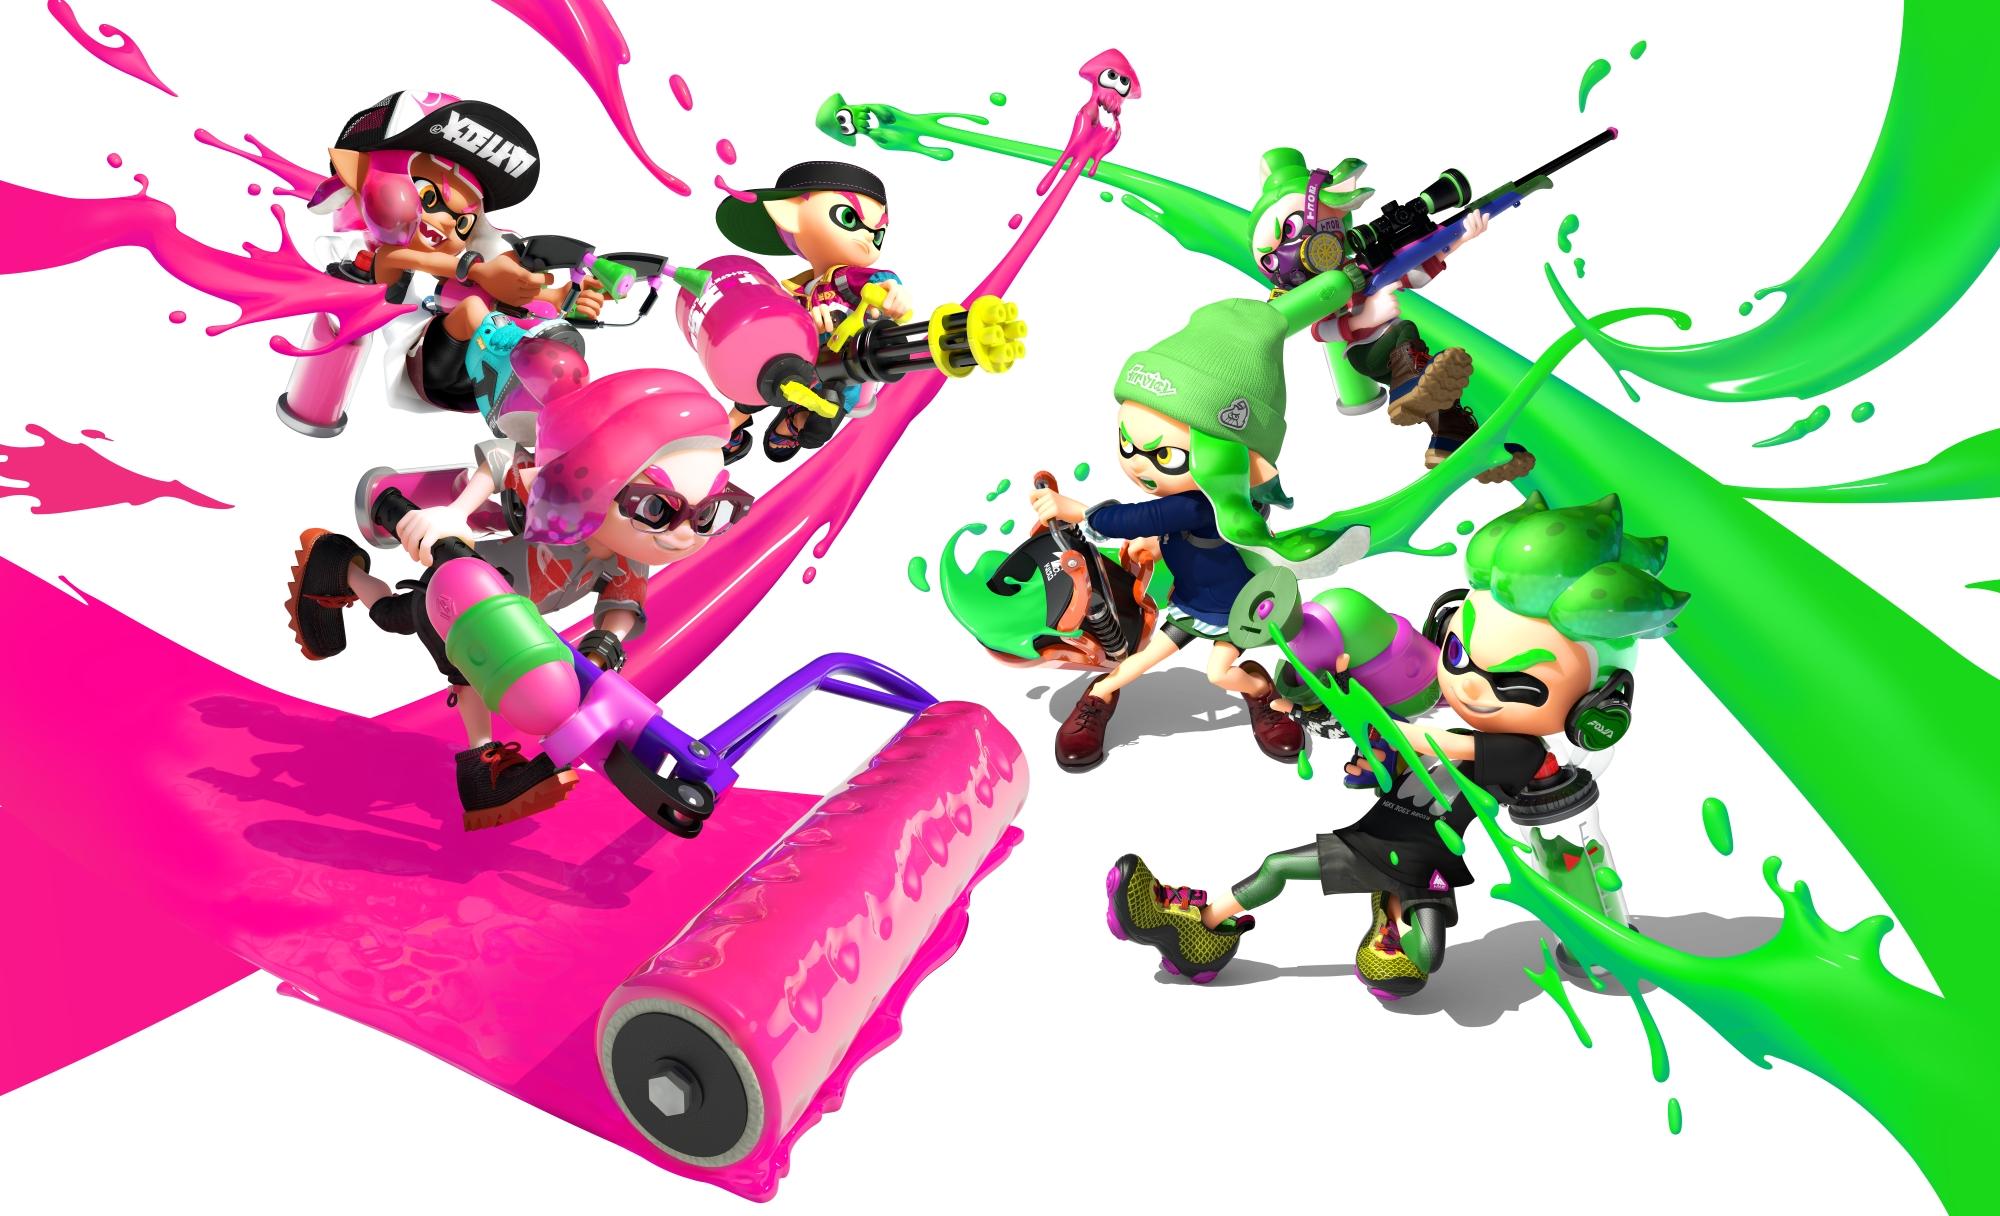 Splatoon 2 - the Nintendo Switch's next big game